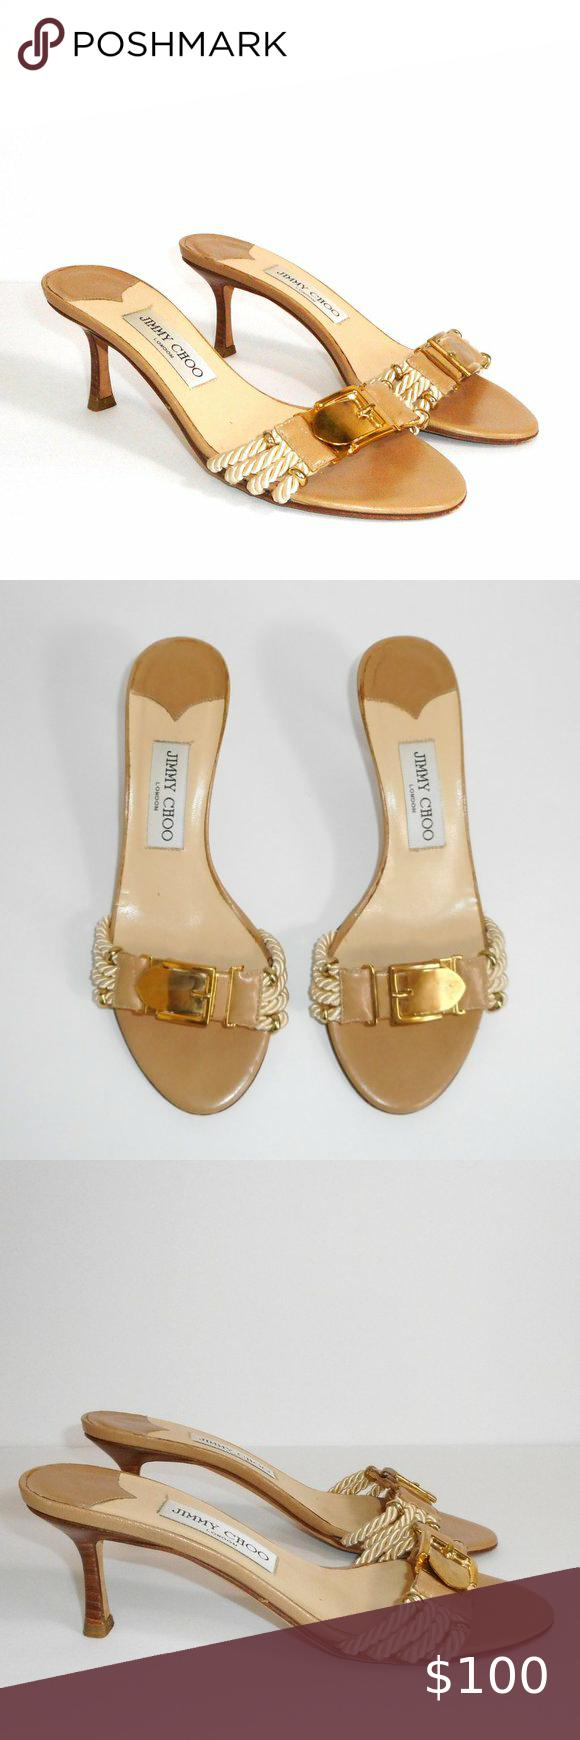 Jimmy Choo Vintage Rope Buckle Kitten Heel Sandal In 2020 Kitten Heel Sandals Jimmy Choo Shoes Heels Shoes Women Heels